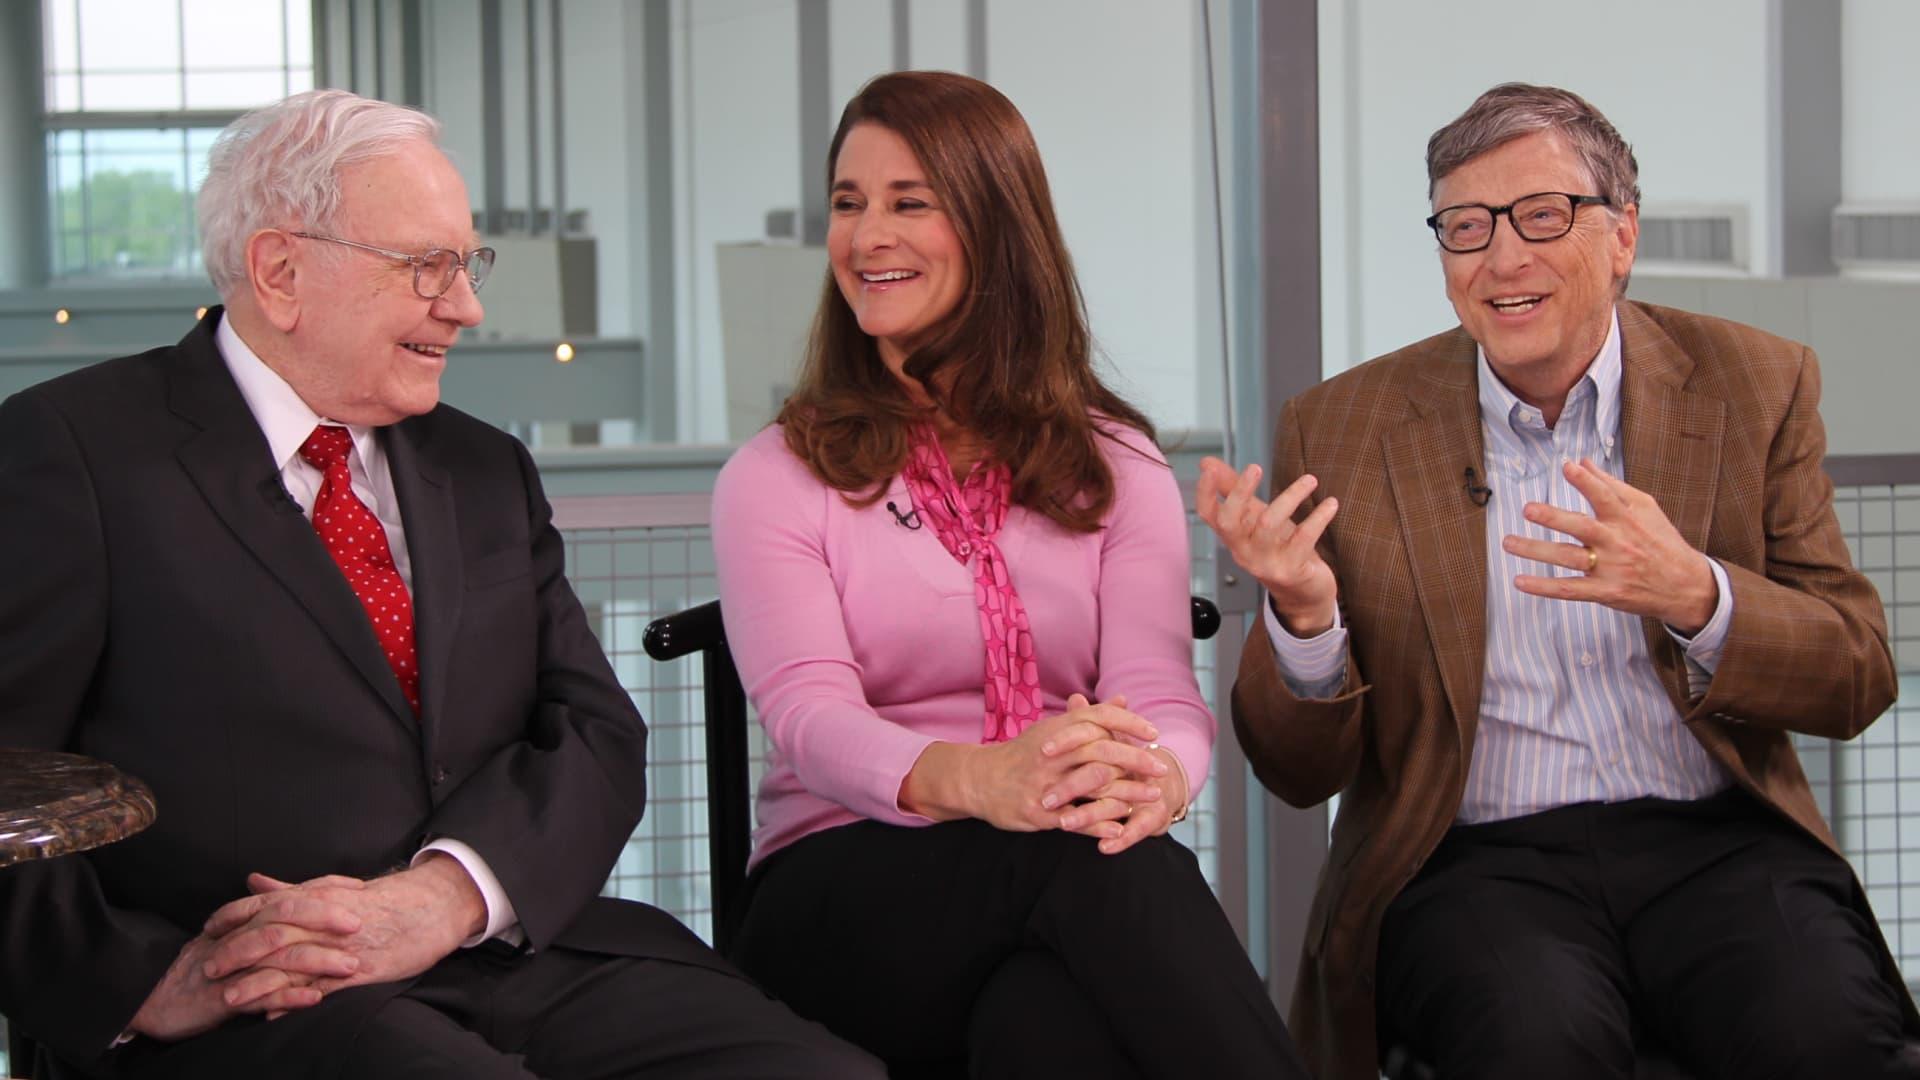 Warren Buffett, Melinda and Bill Gates discuss philanthropy.